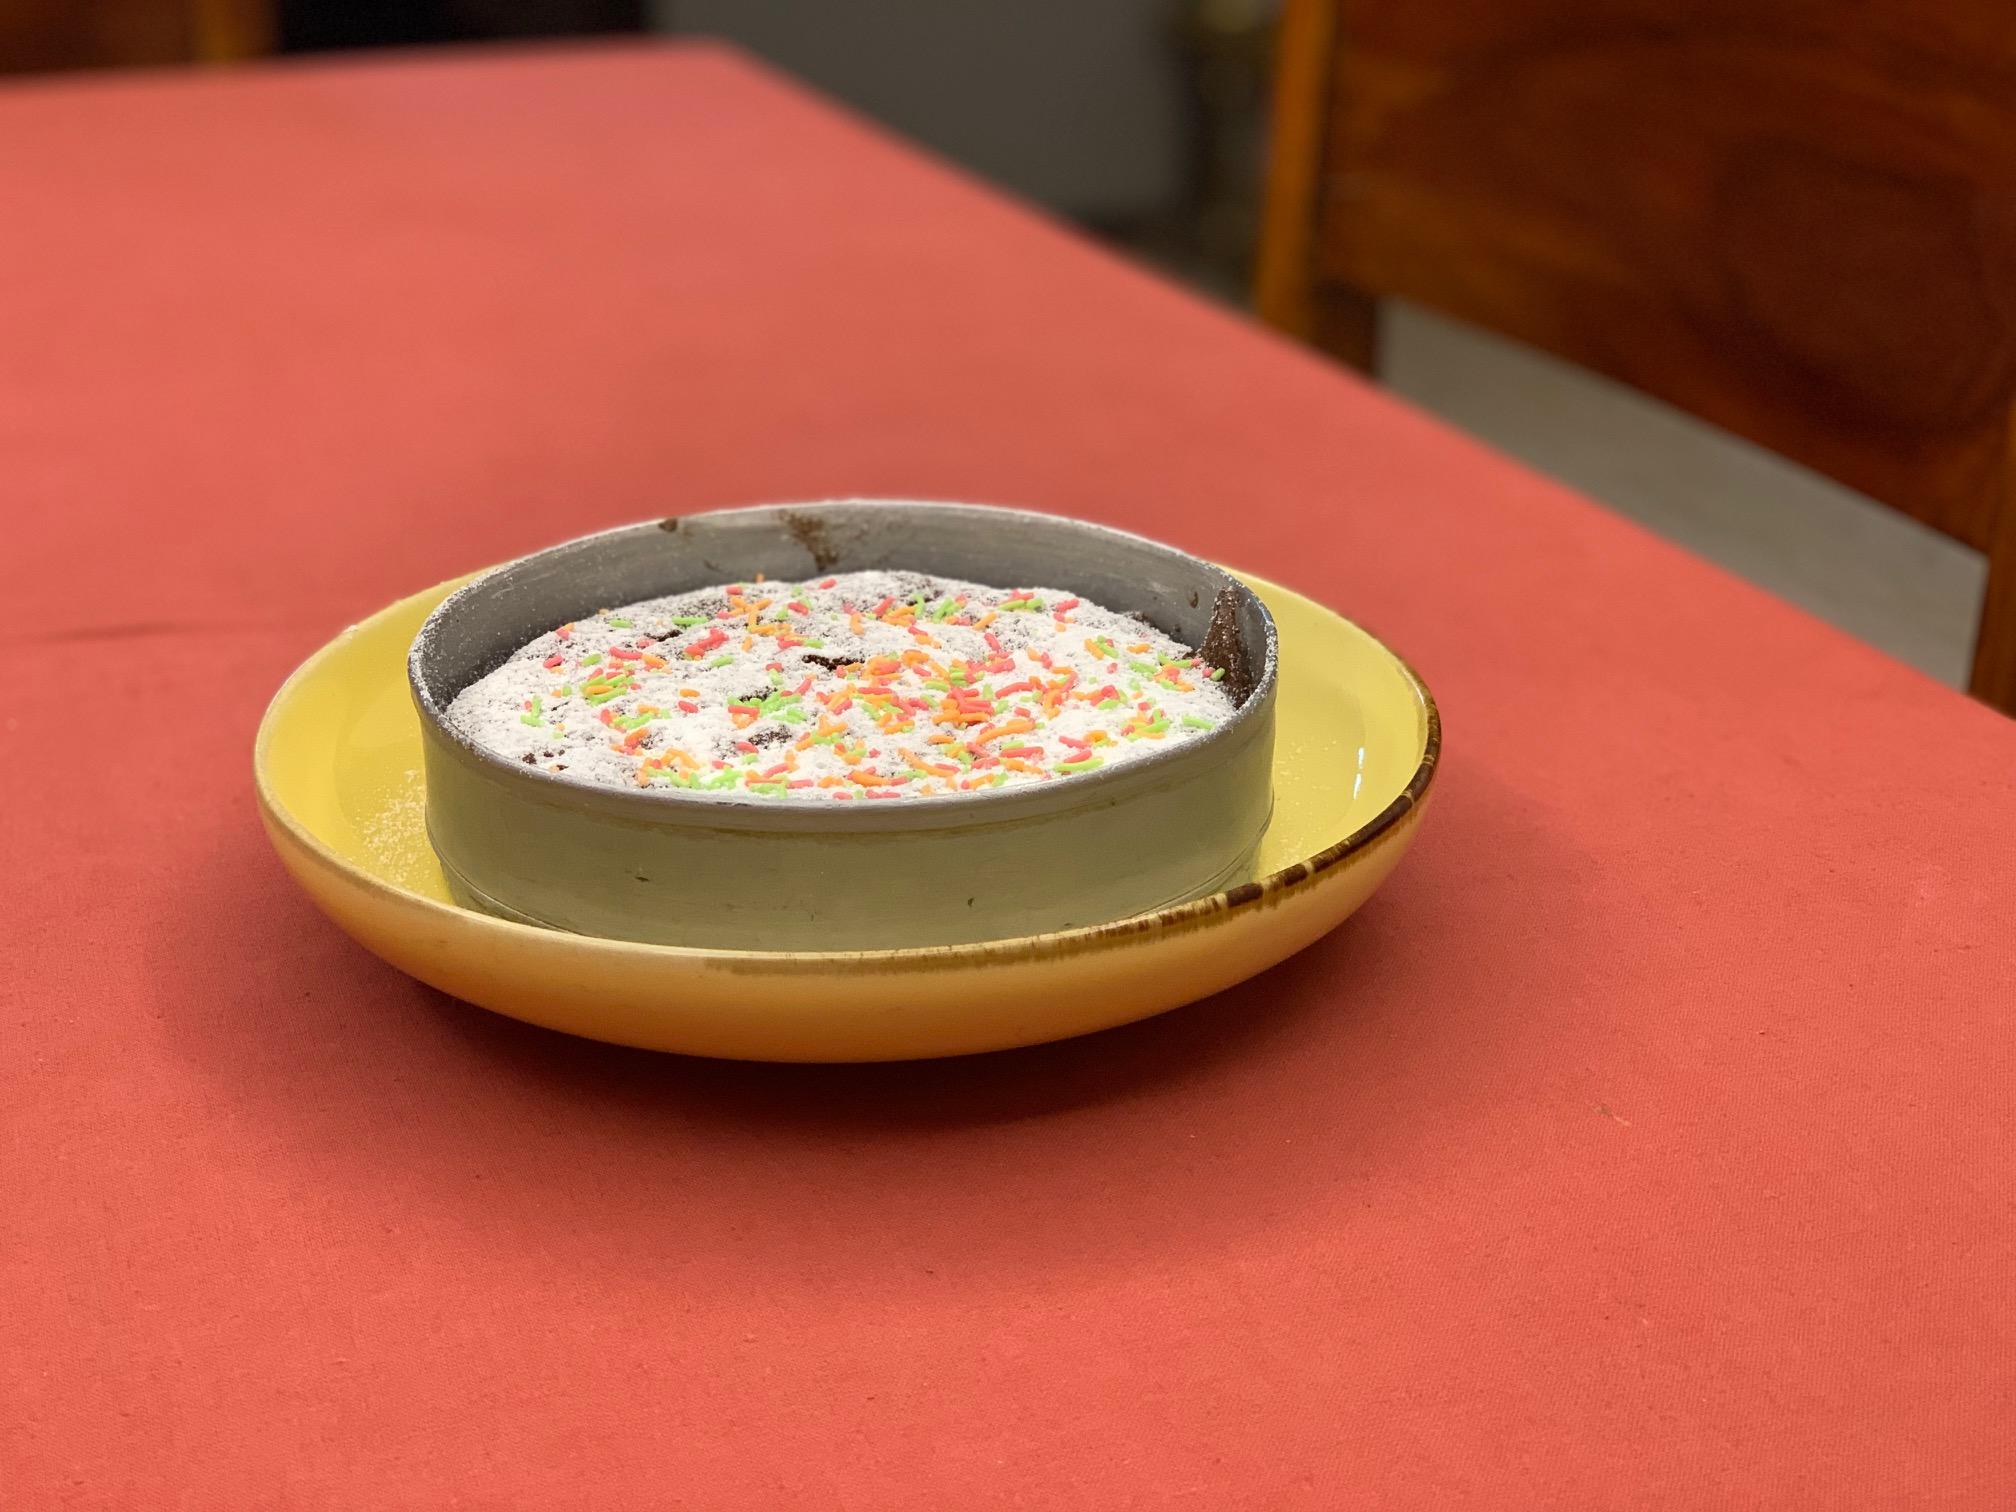 Pillsbury Cooker Chocolate Cake (Eggless): #FirstImpressions